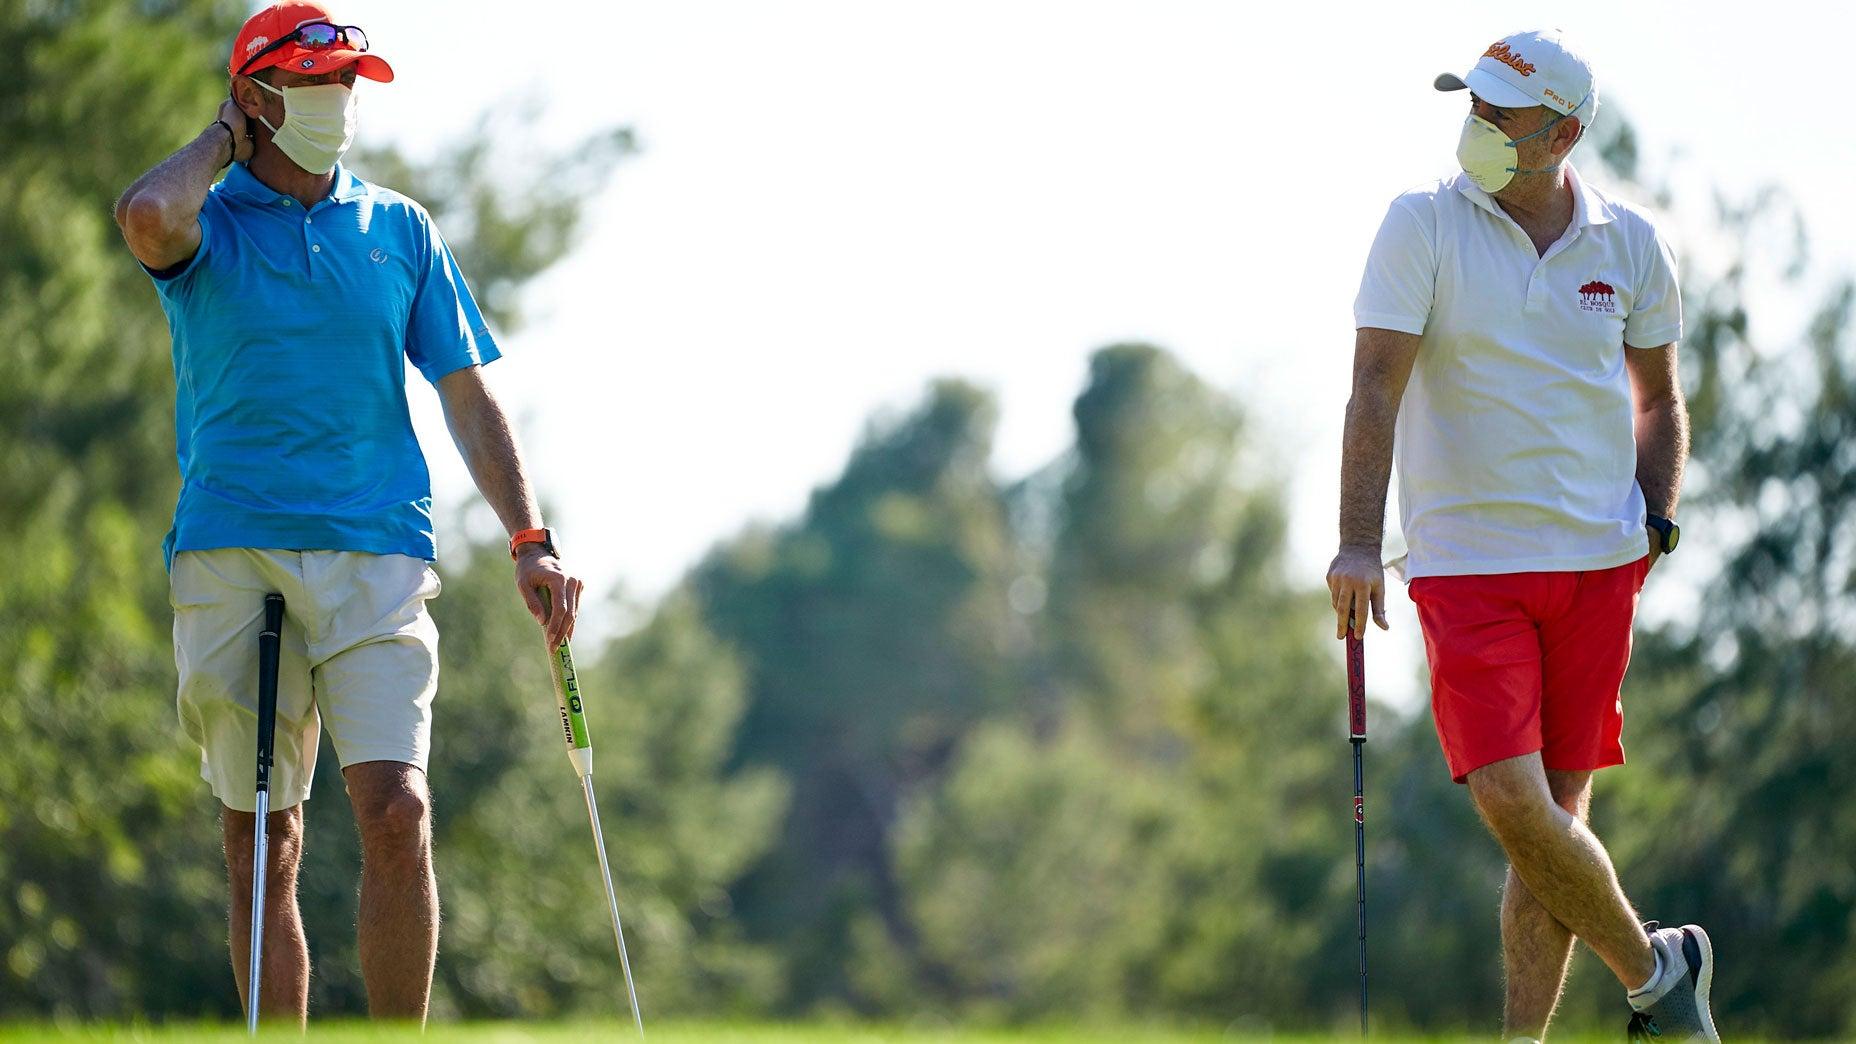 crestlands-farm-pitch-n-putt-golf-course